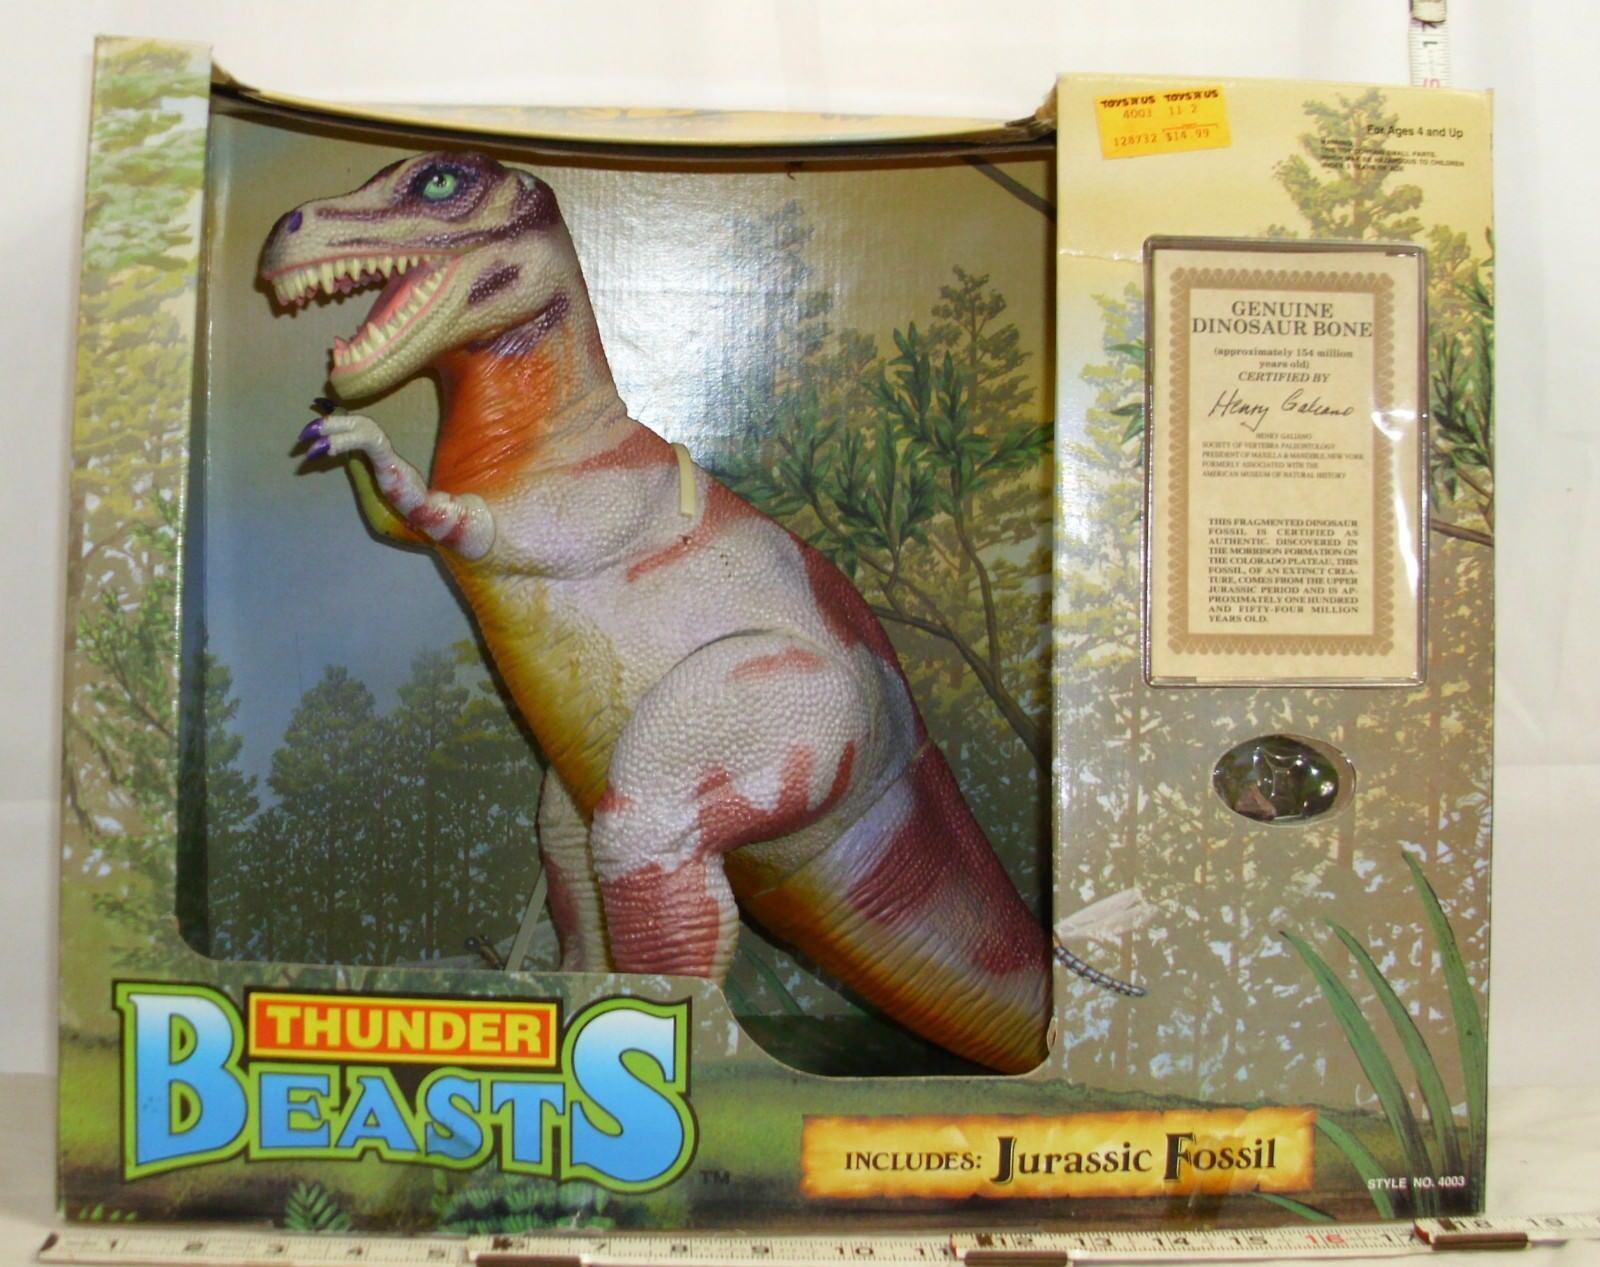 Donner Besteien tyrannosaurus rex dinosaurier - knochen 1993 himmel kinder zahl stillgelegt